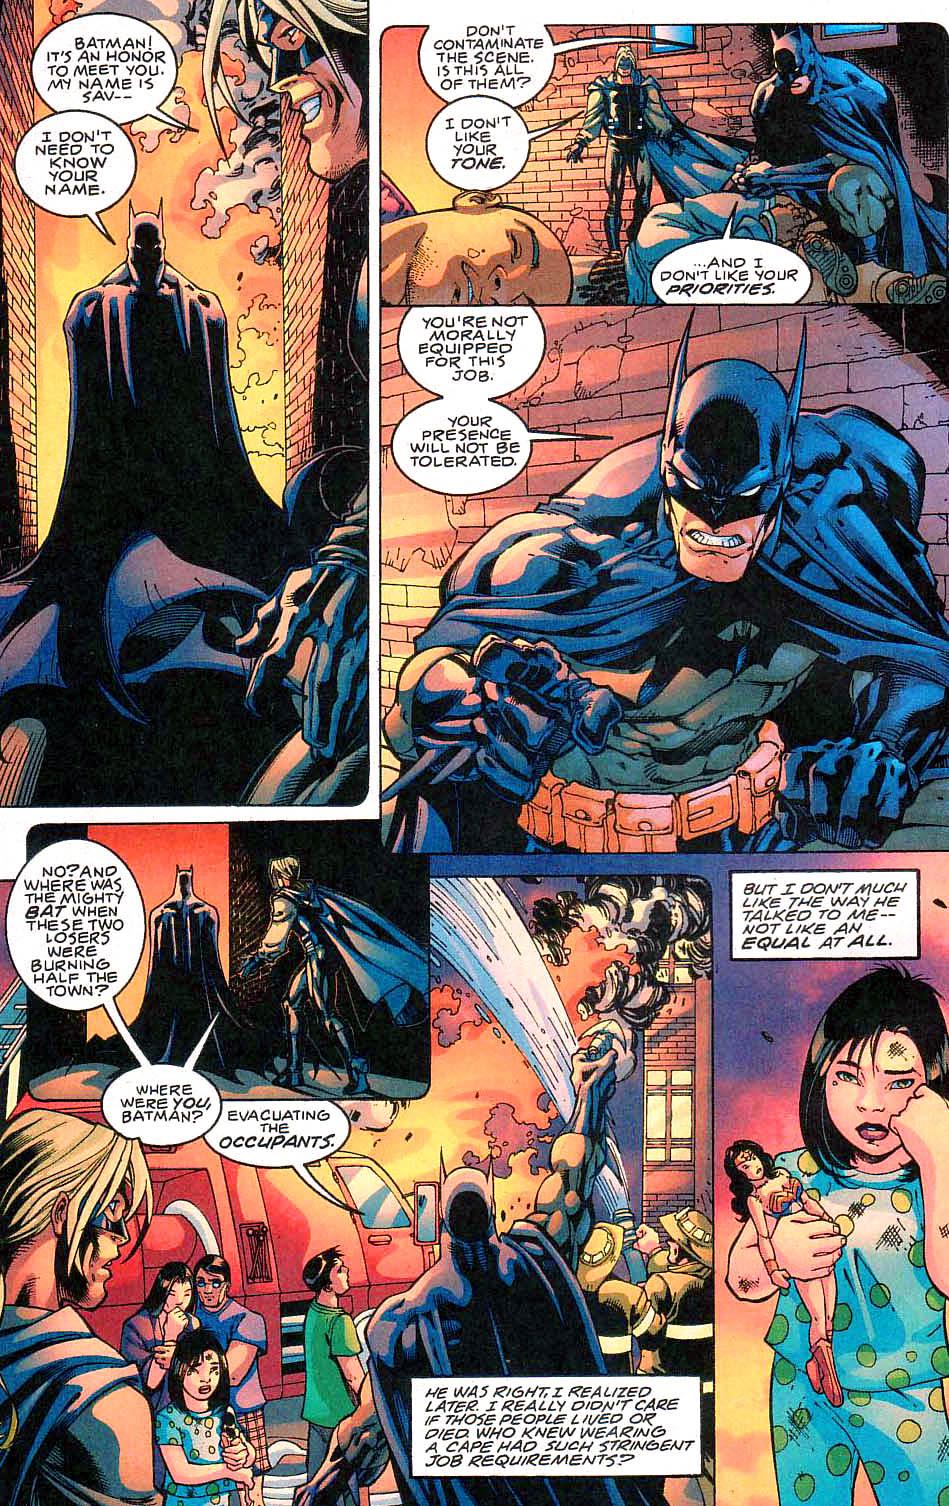 058 06 Savant Batman.jpg